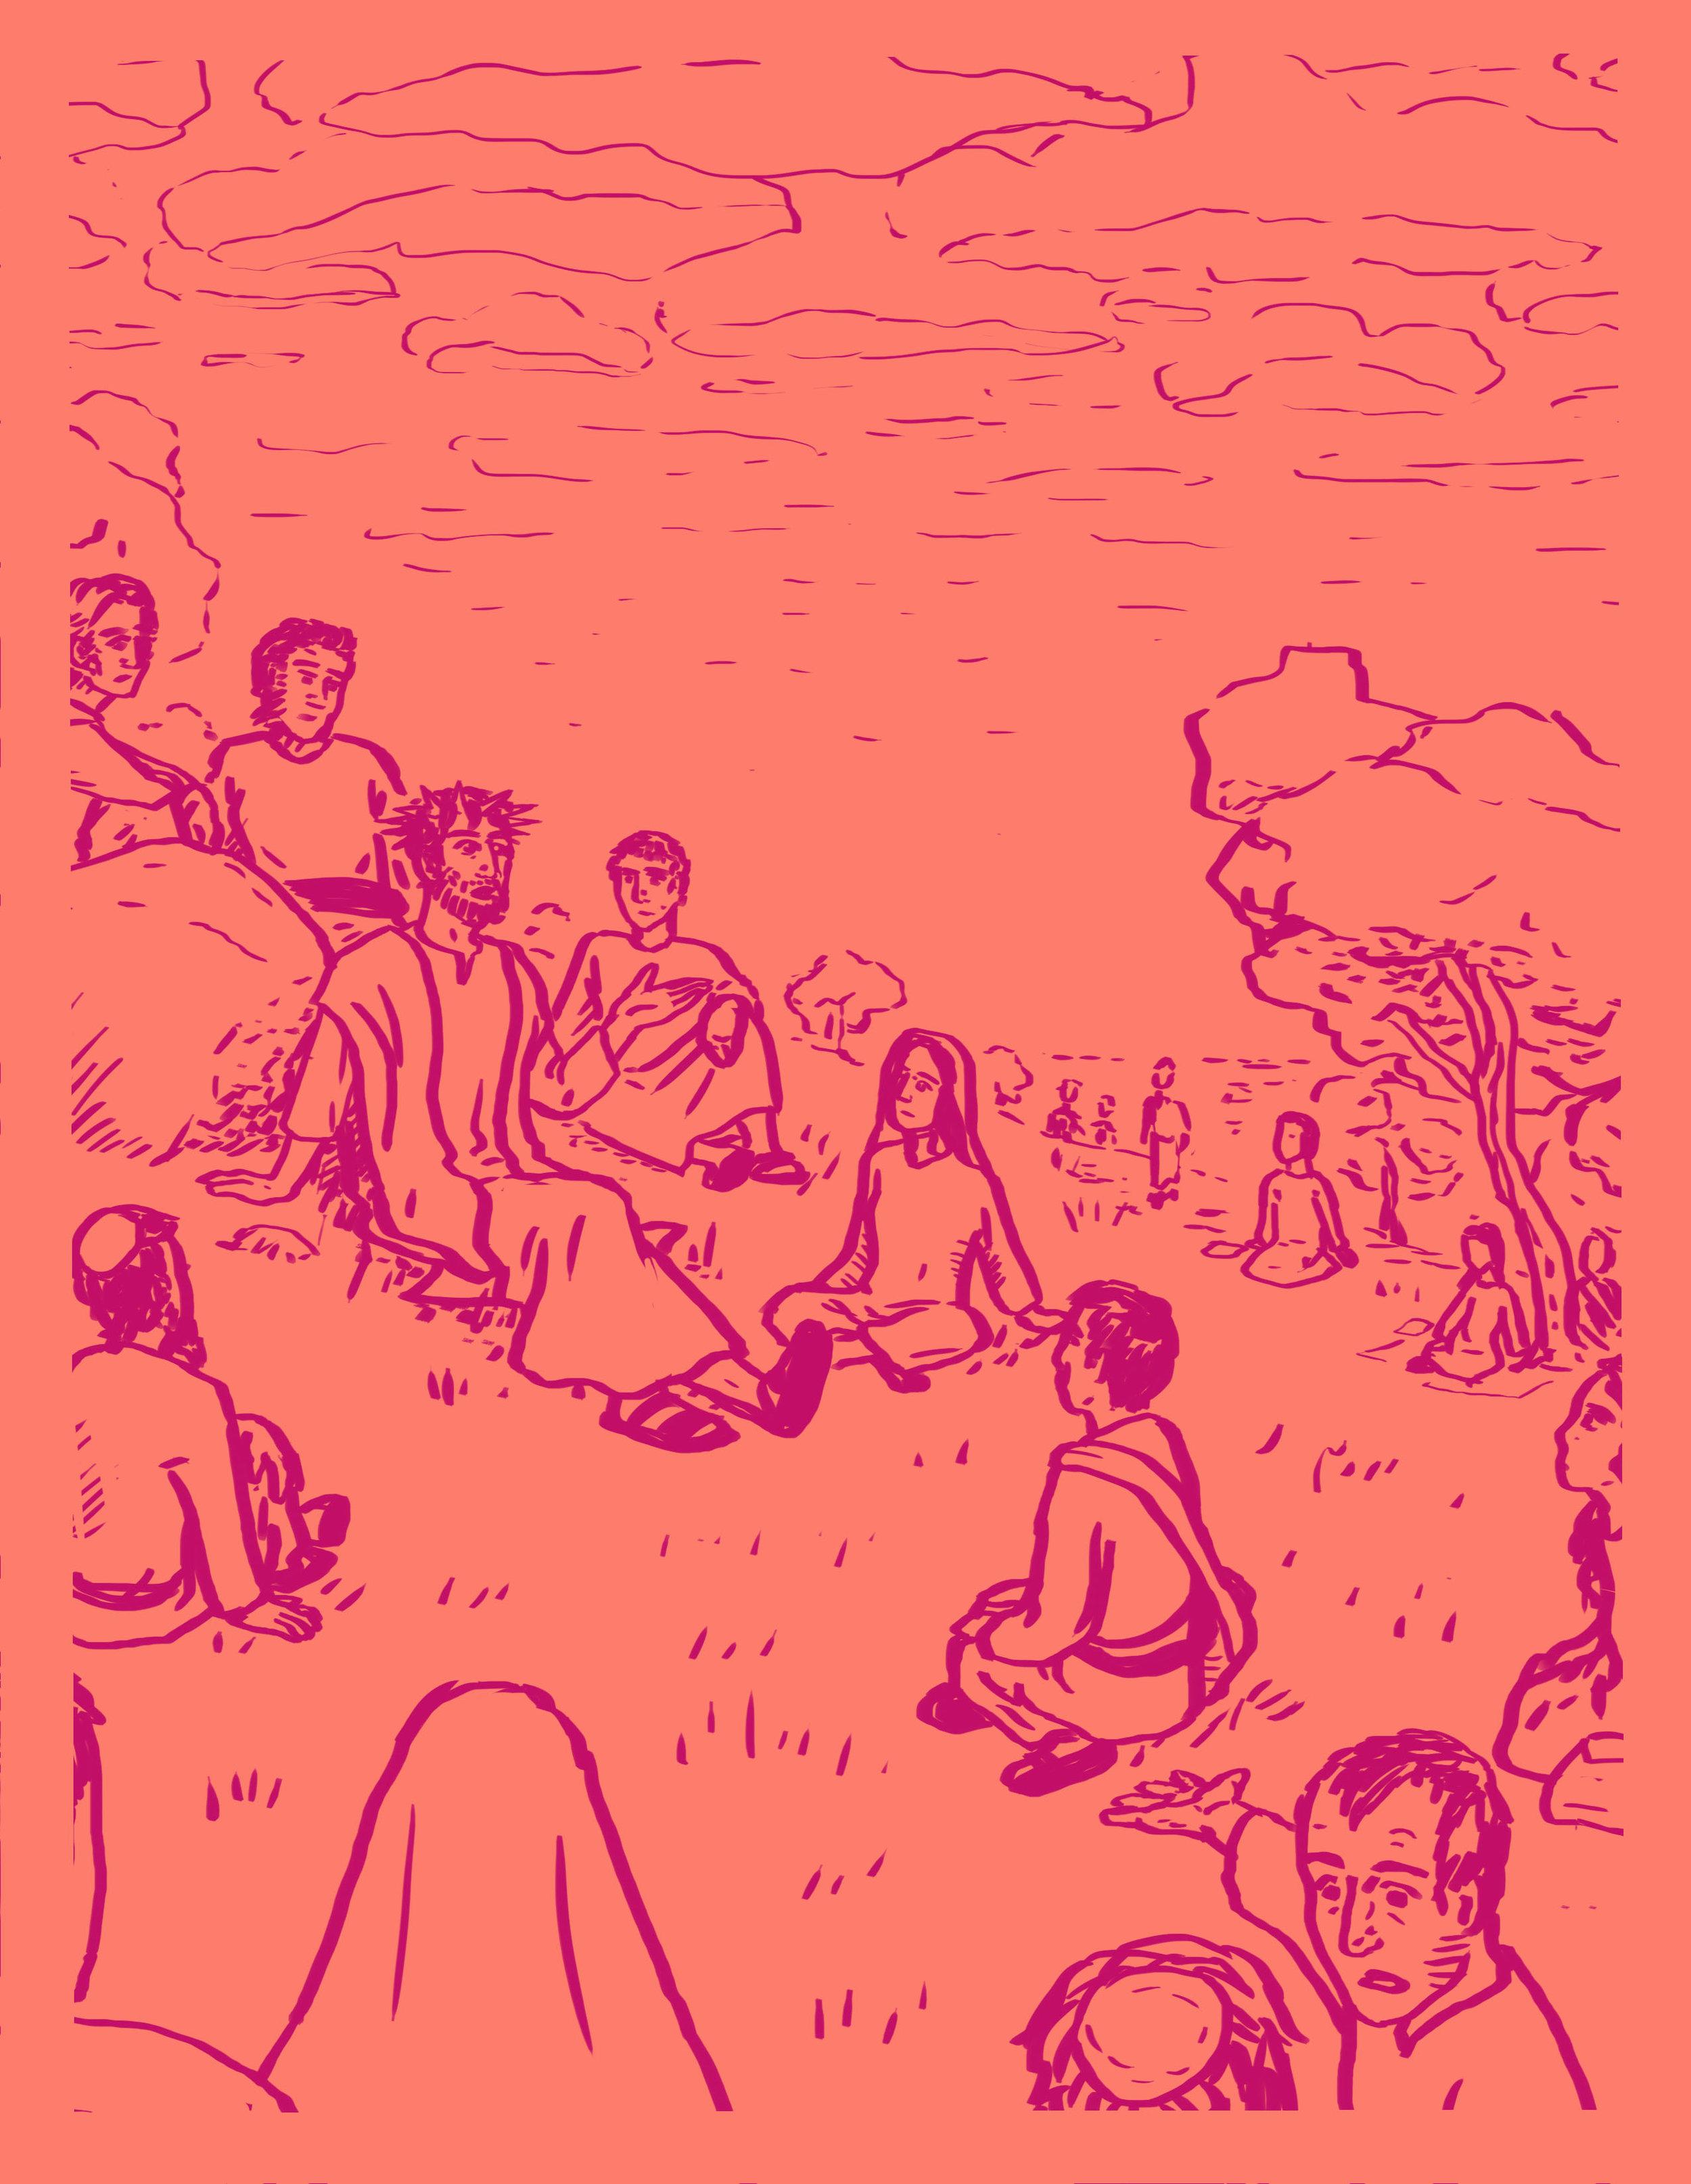 Lent Illustrations 2019Artboard 5.jpg